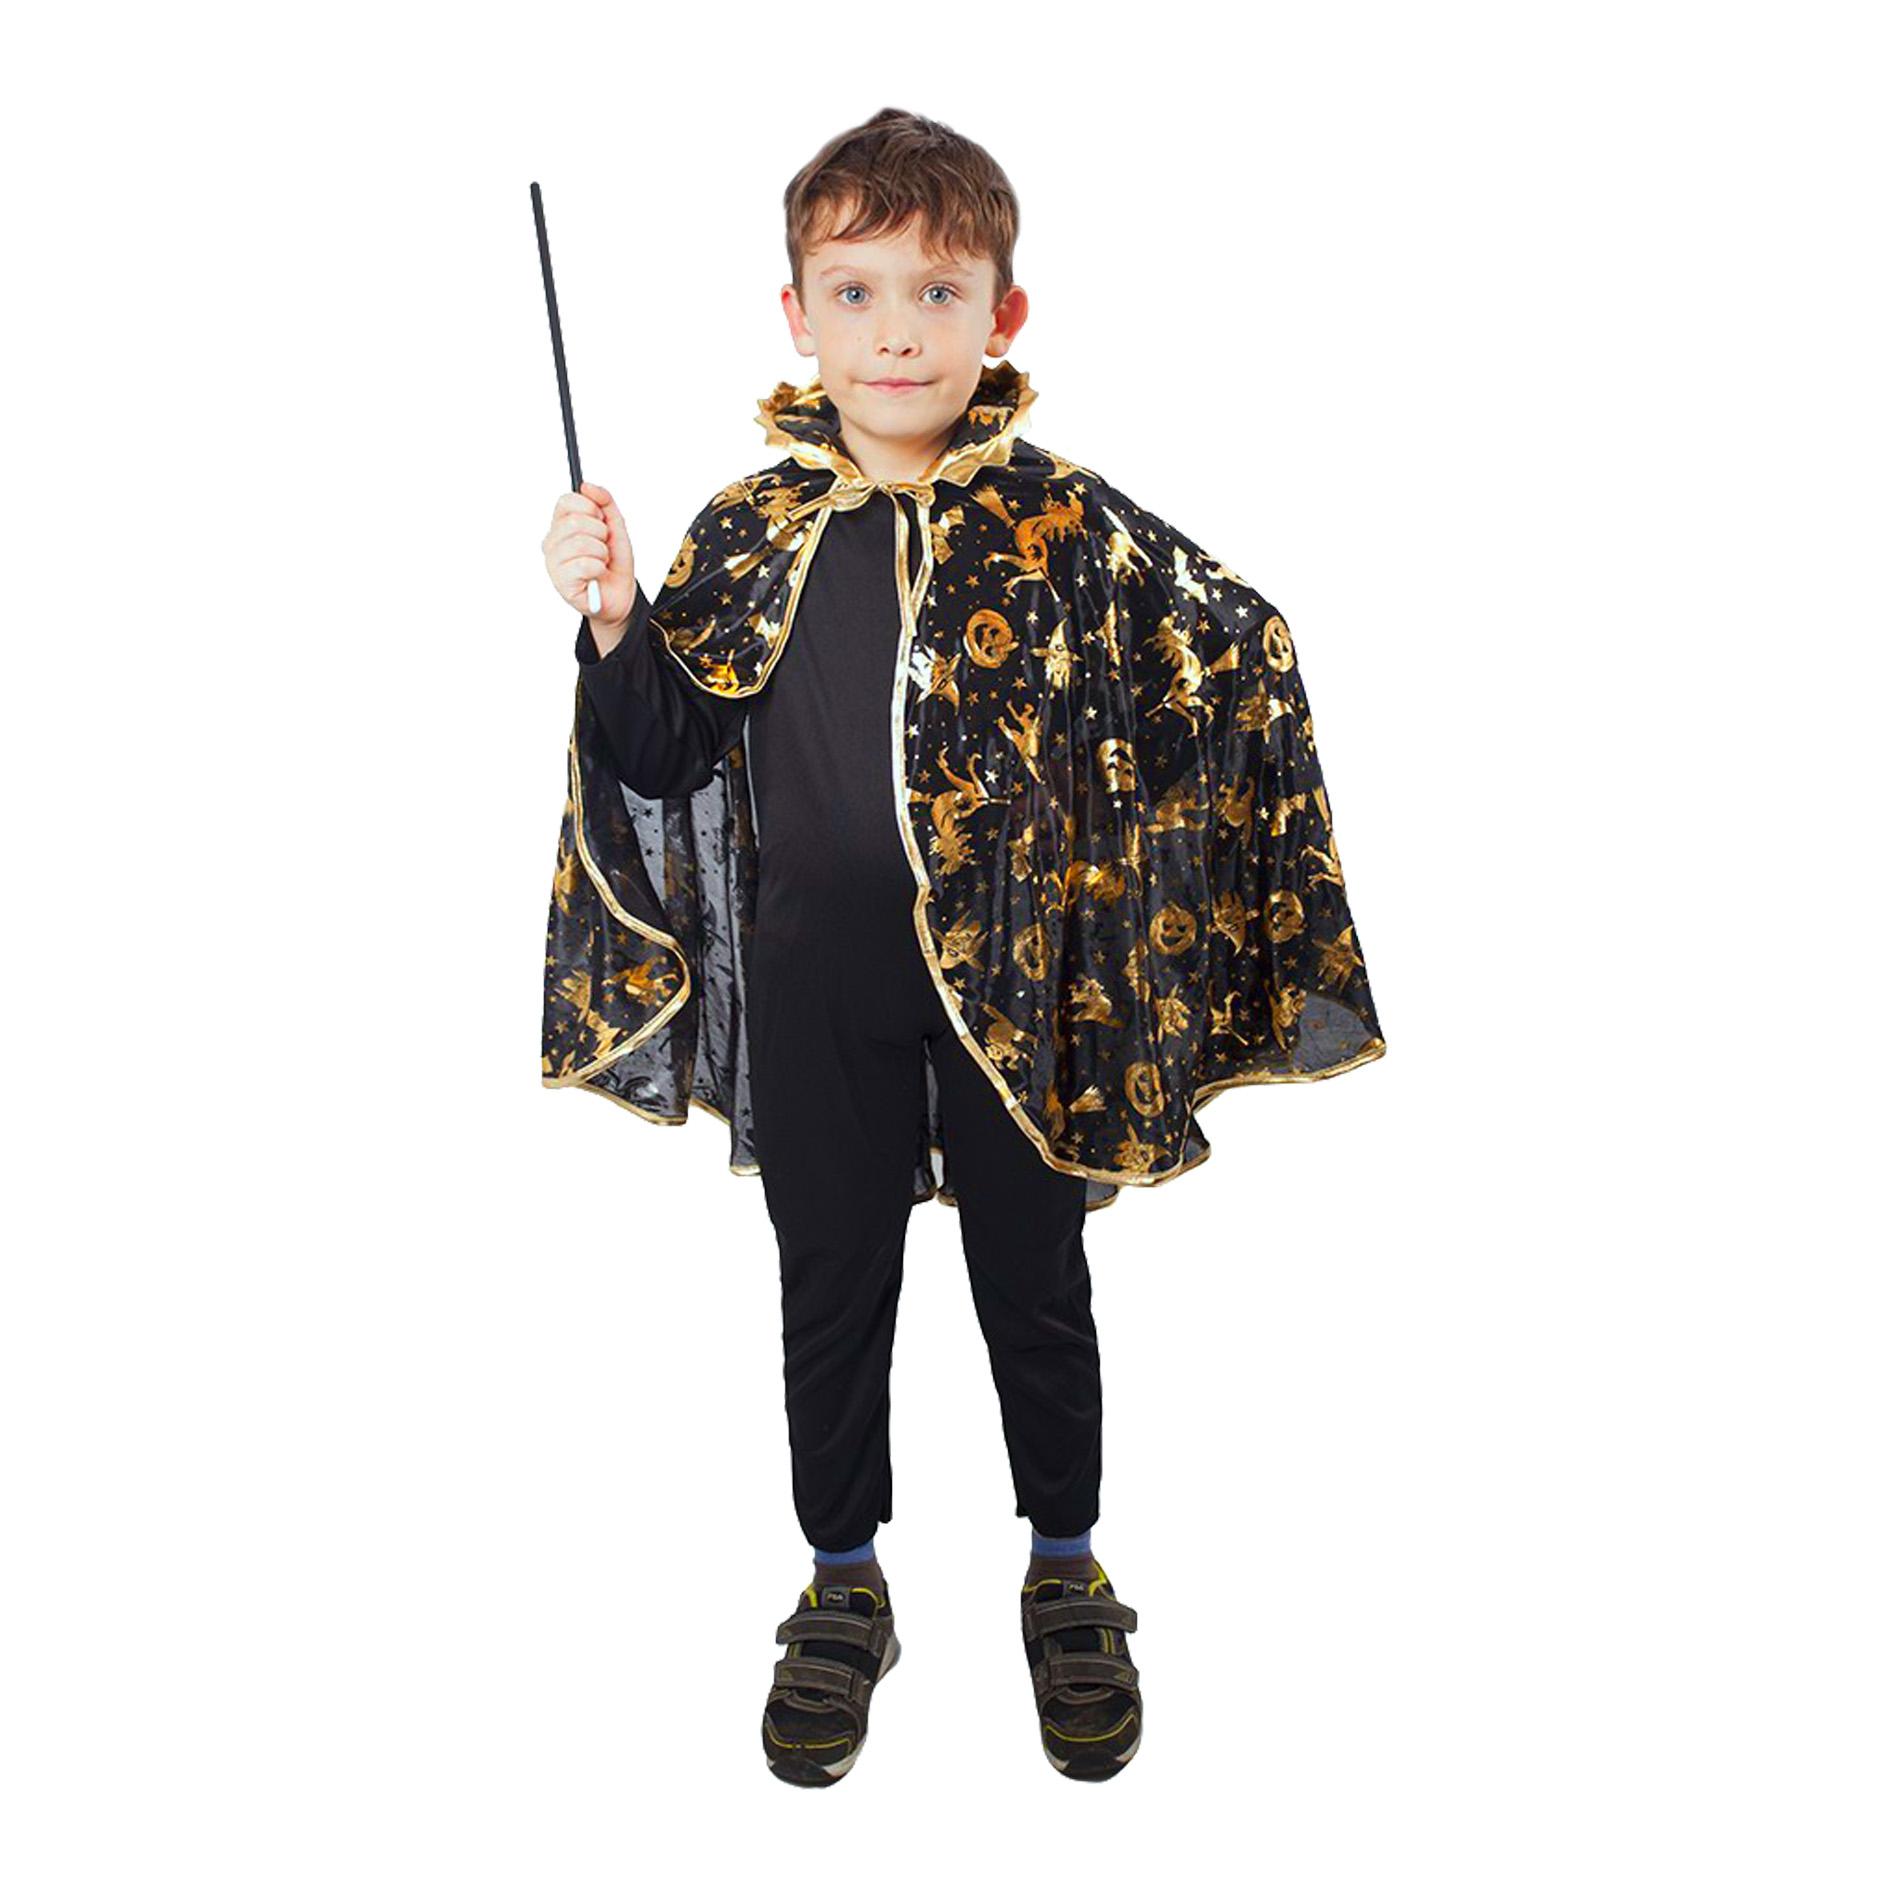 Dětský plášť Čaroděj černý čarodějnice / Halloween